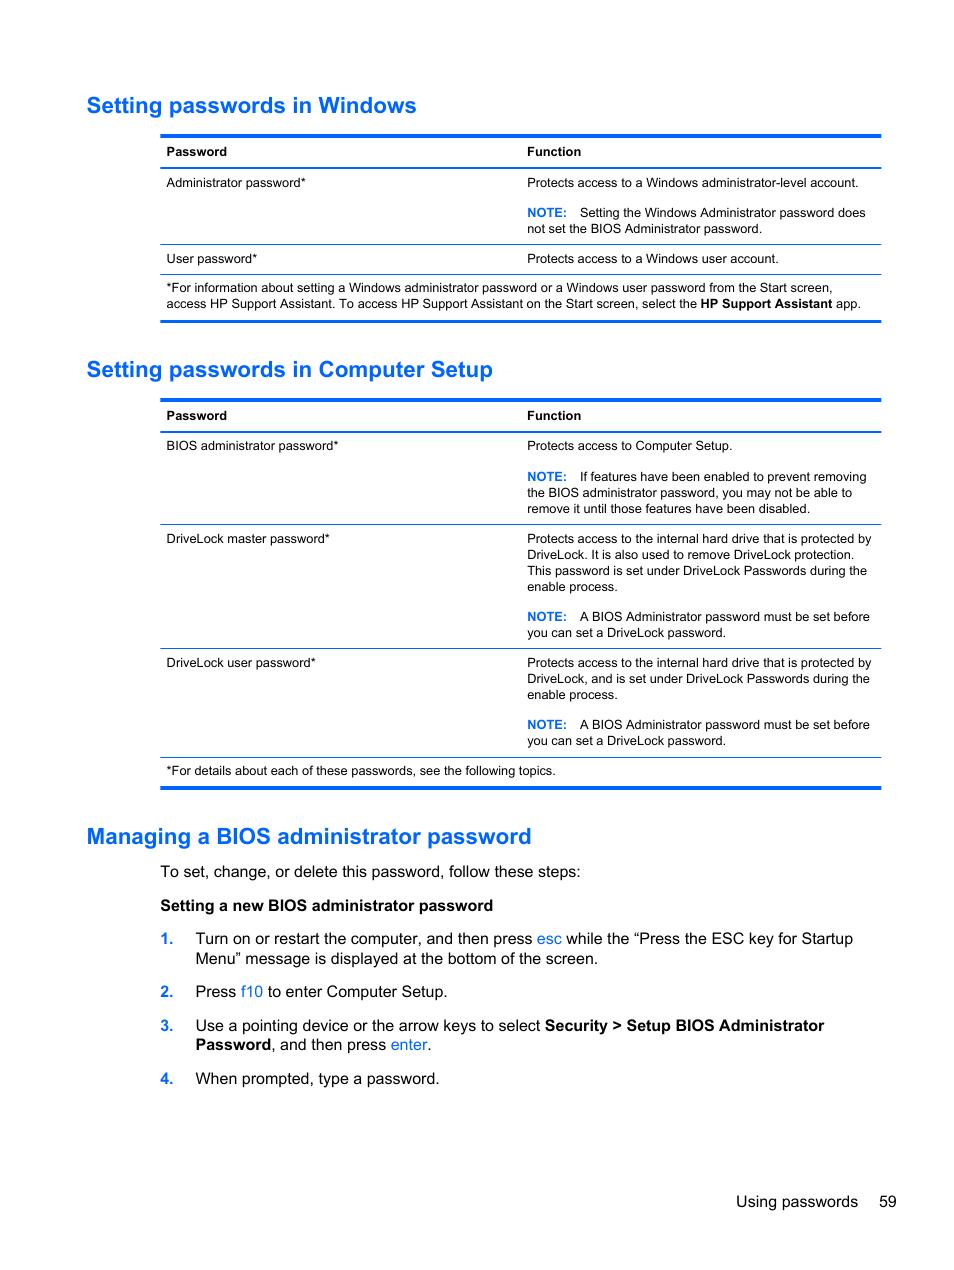 Setting passwords in windows, Setting passwords in computer